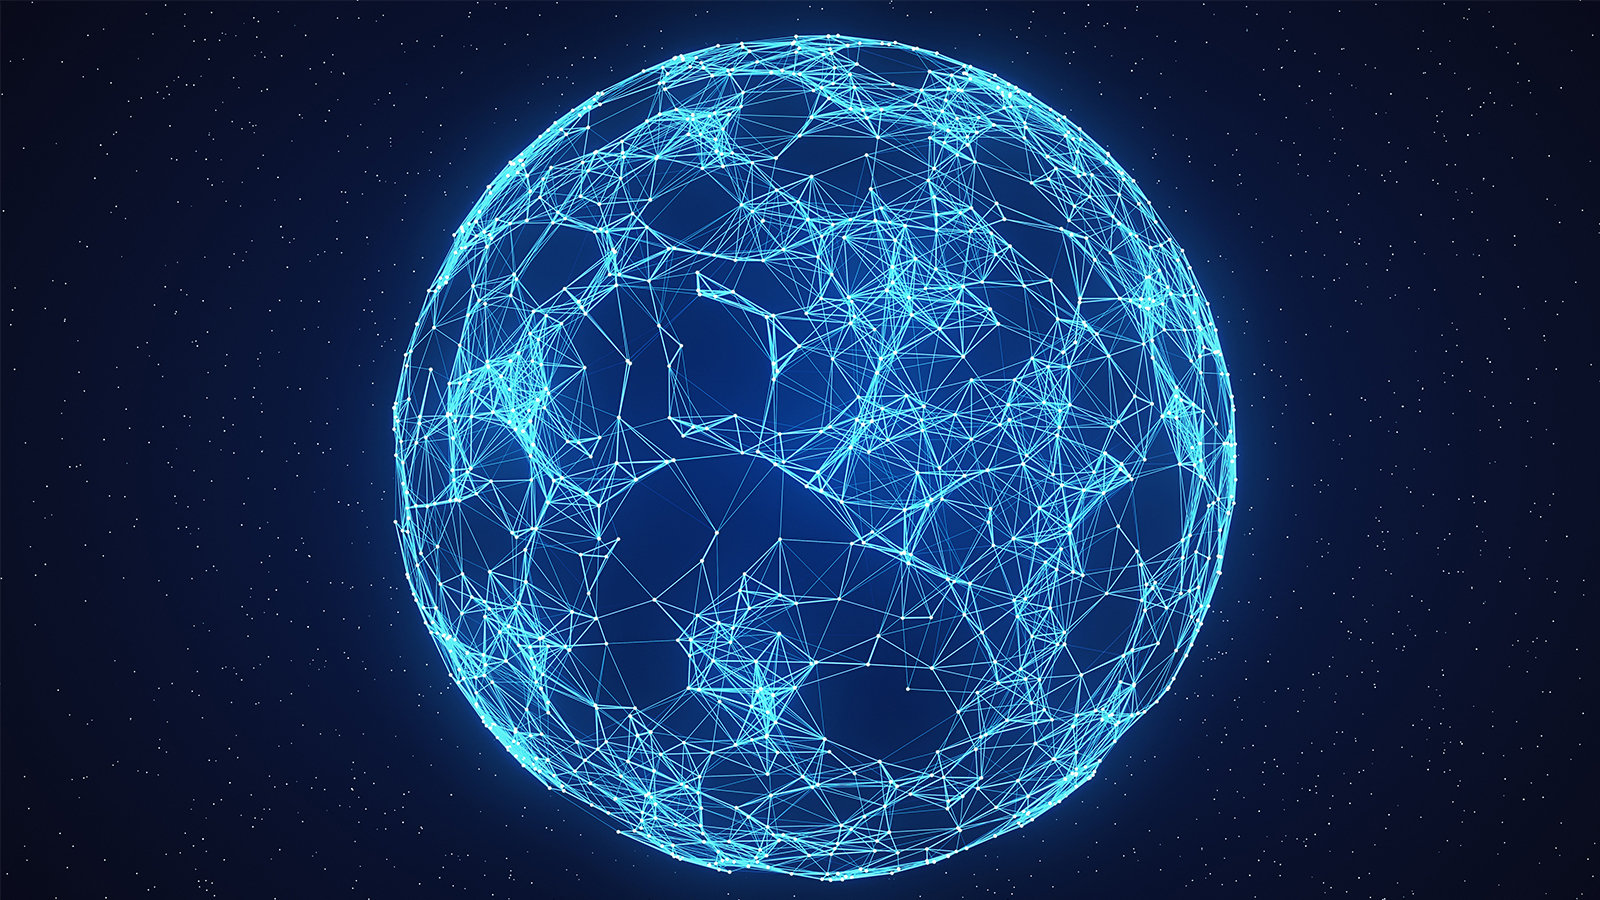 15 Best Torrent Sites in September 2019 | TechNadu